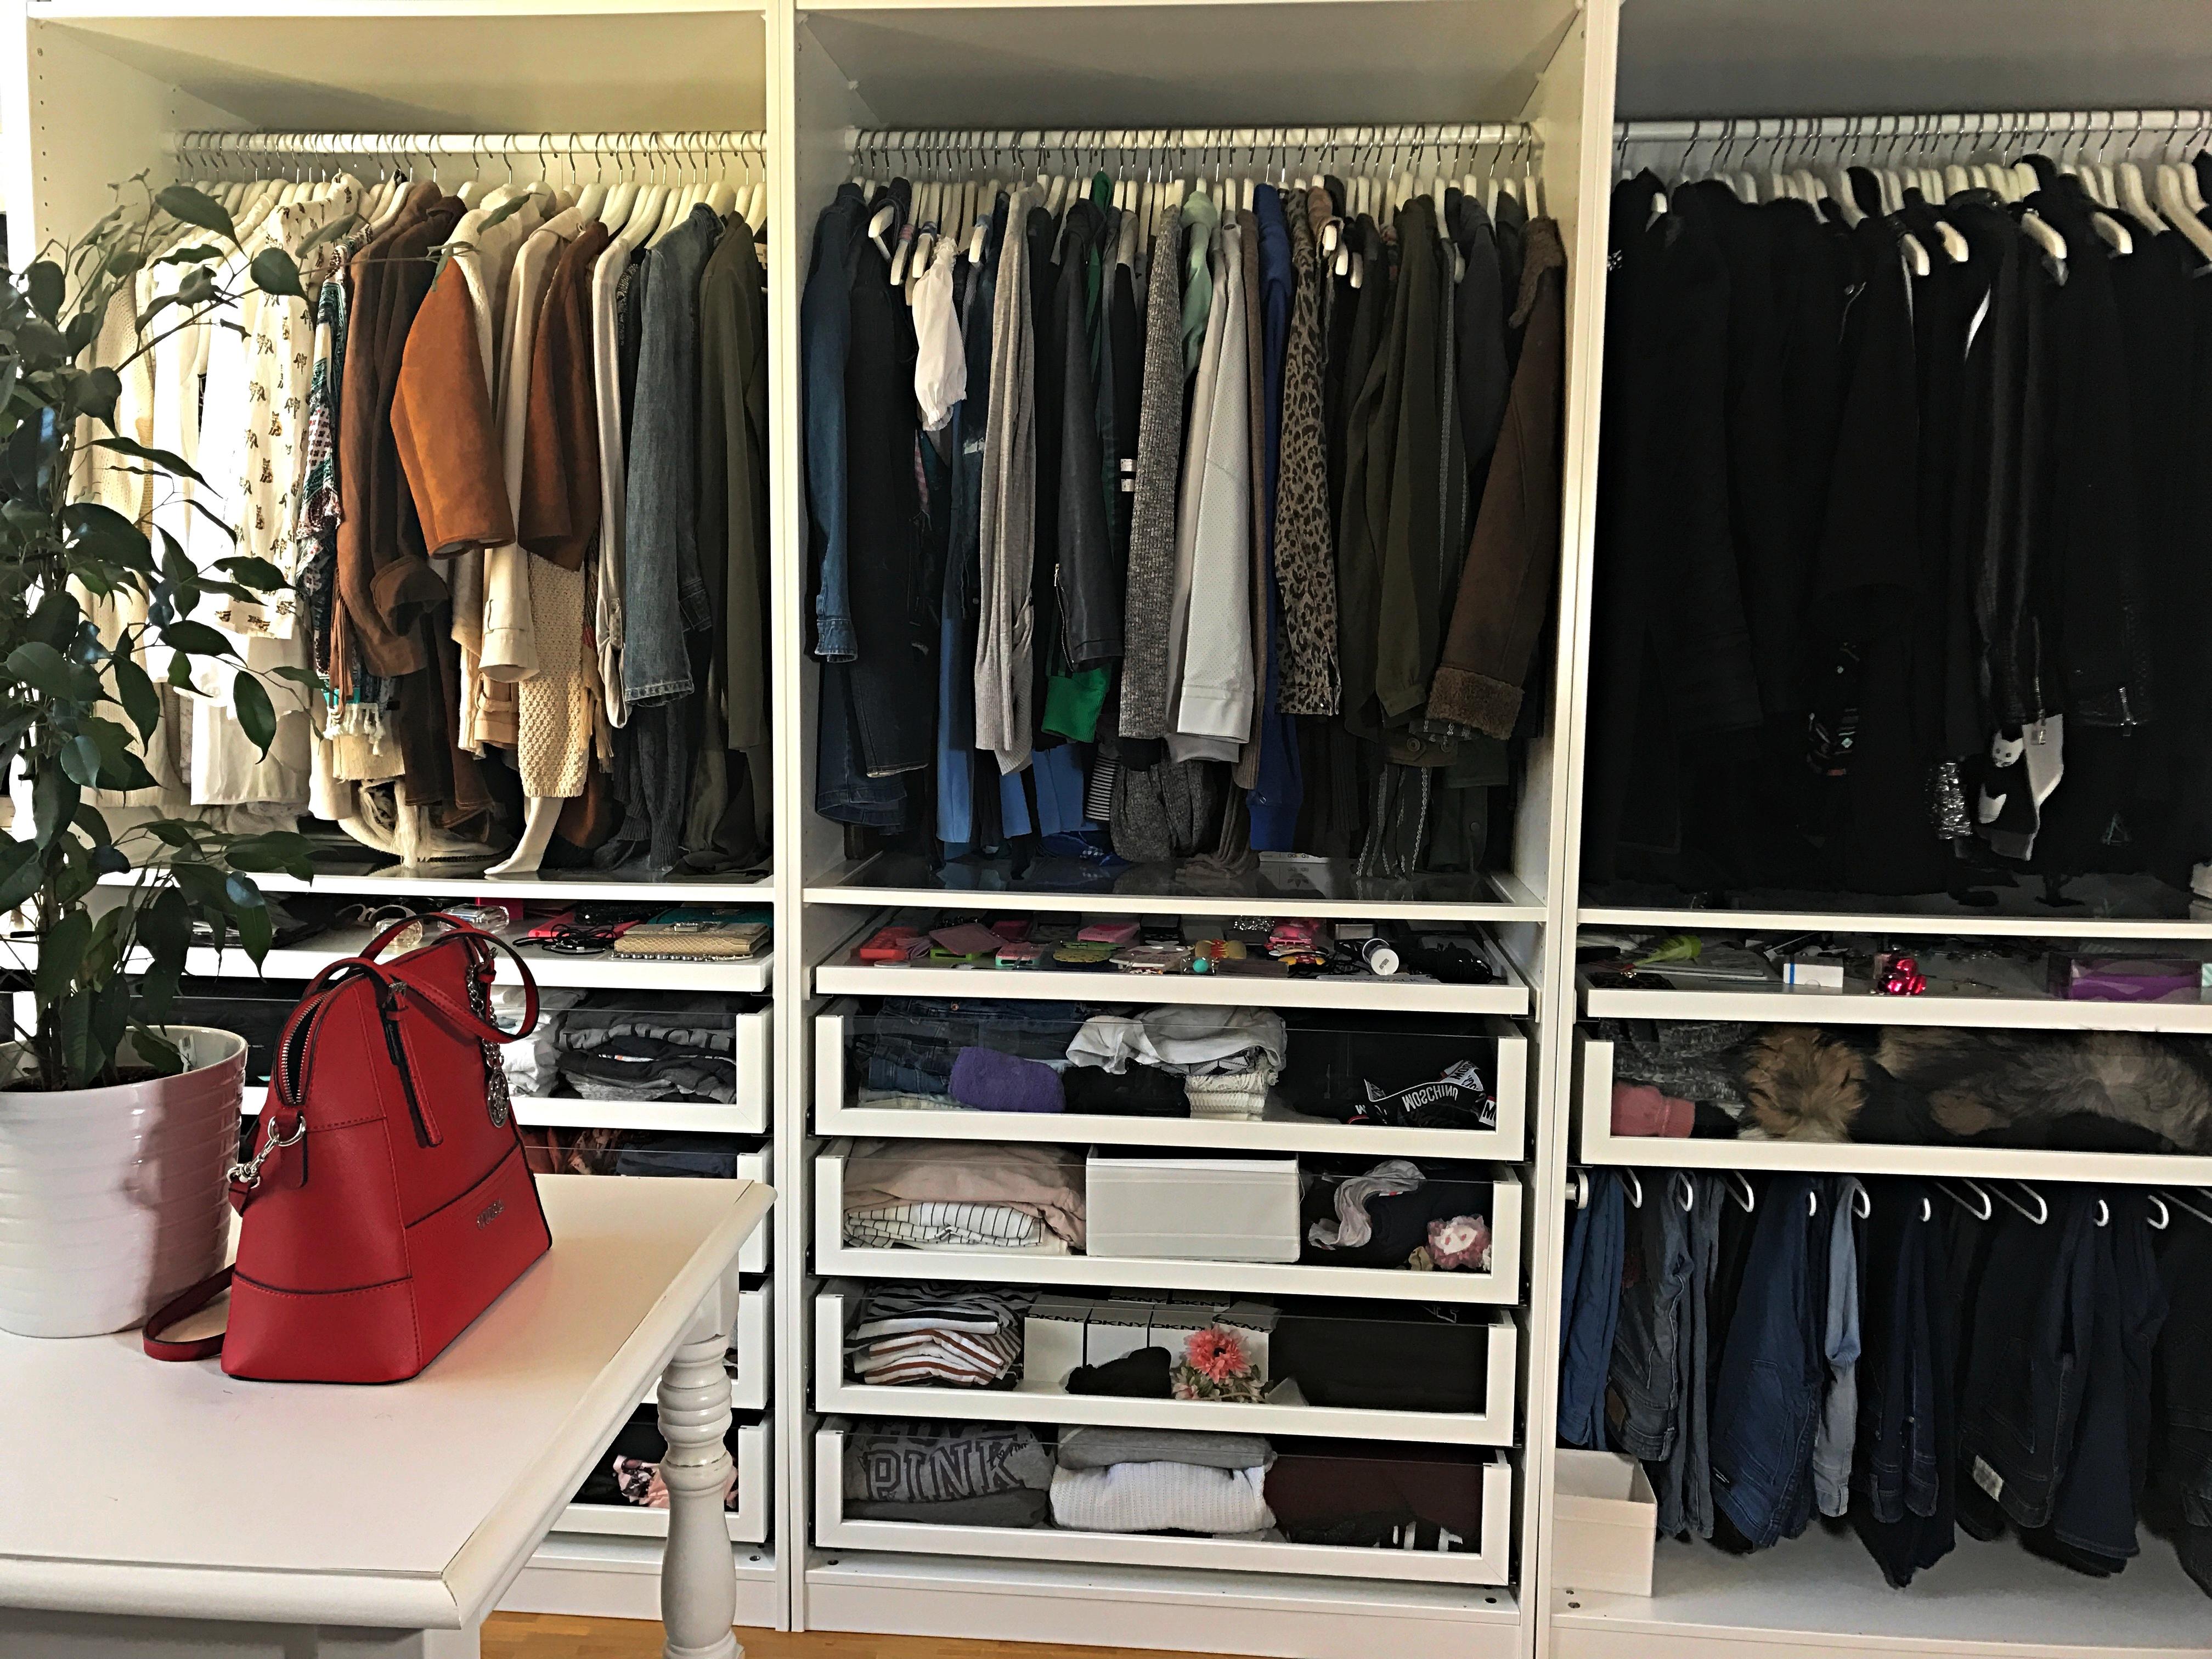 4. Dezember – my closet